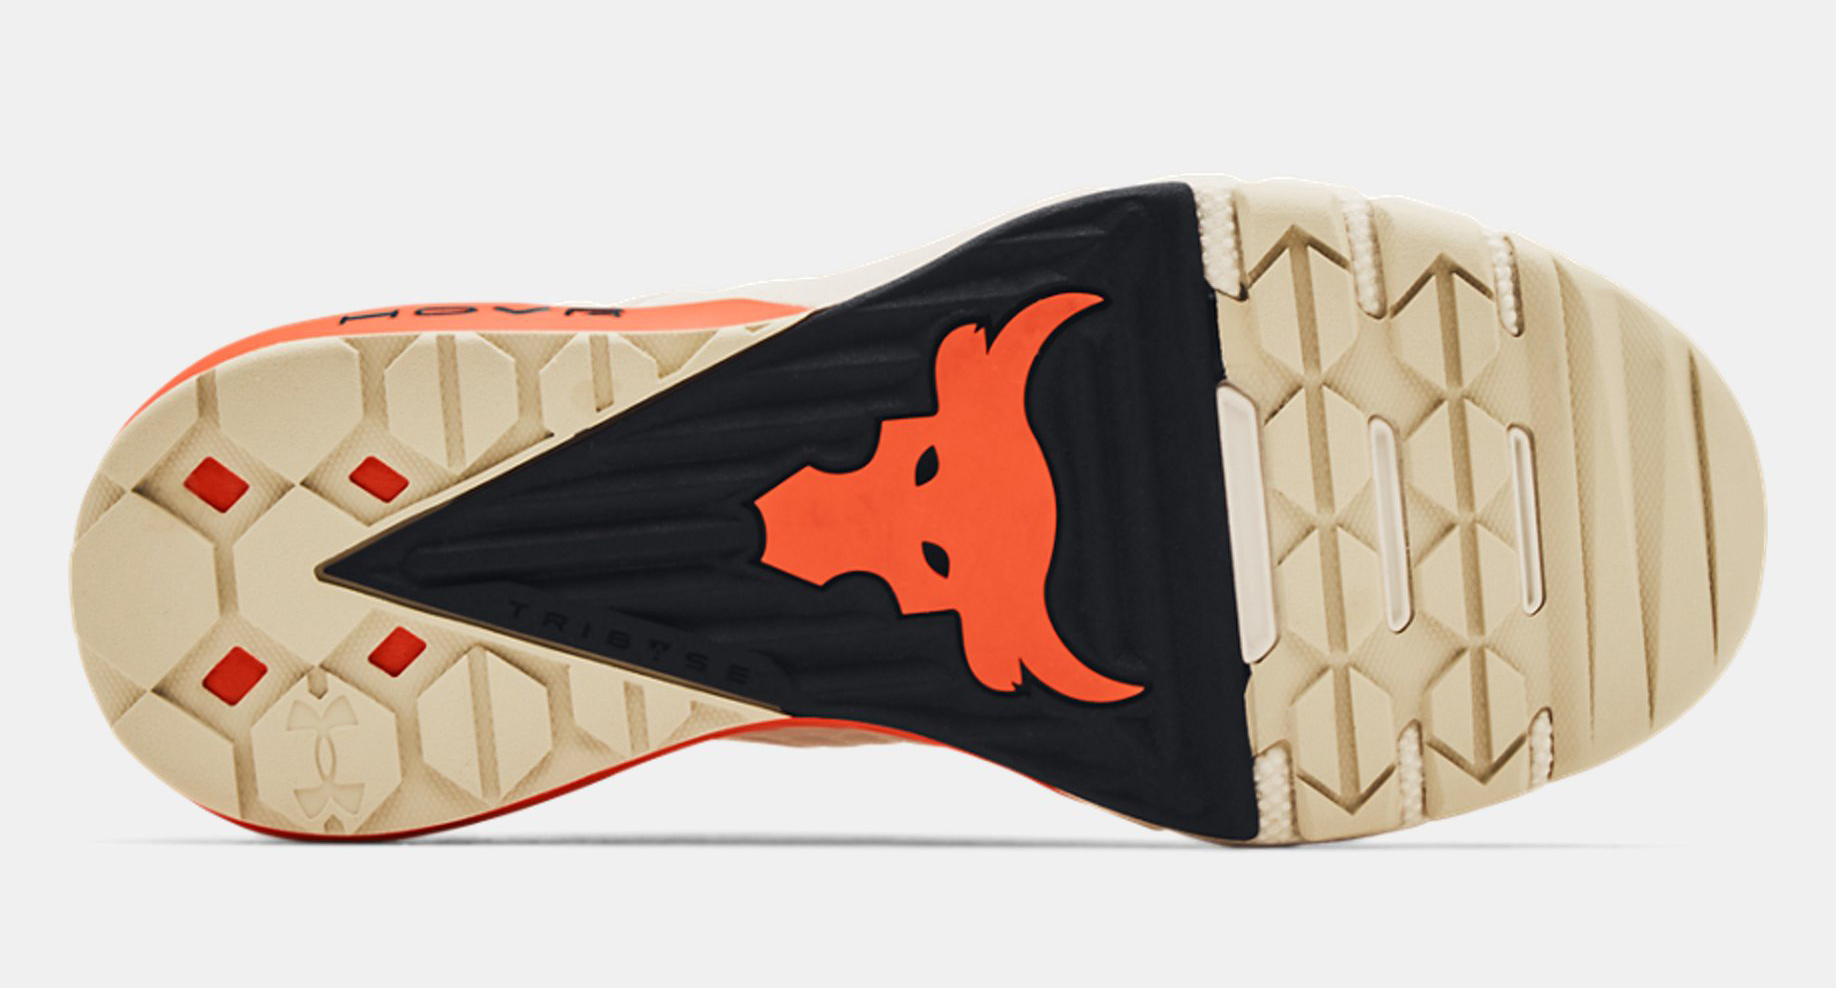 project-rock-3-shoe-summit-white-rogue-orange-5